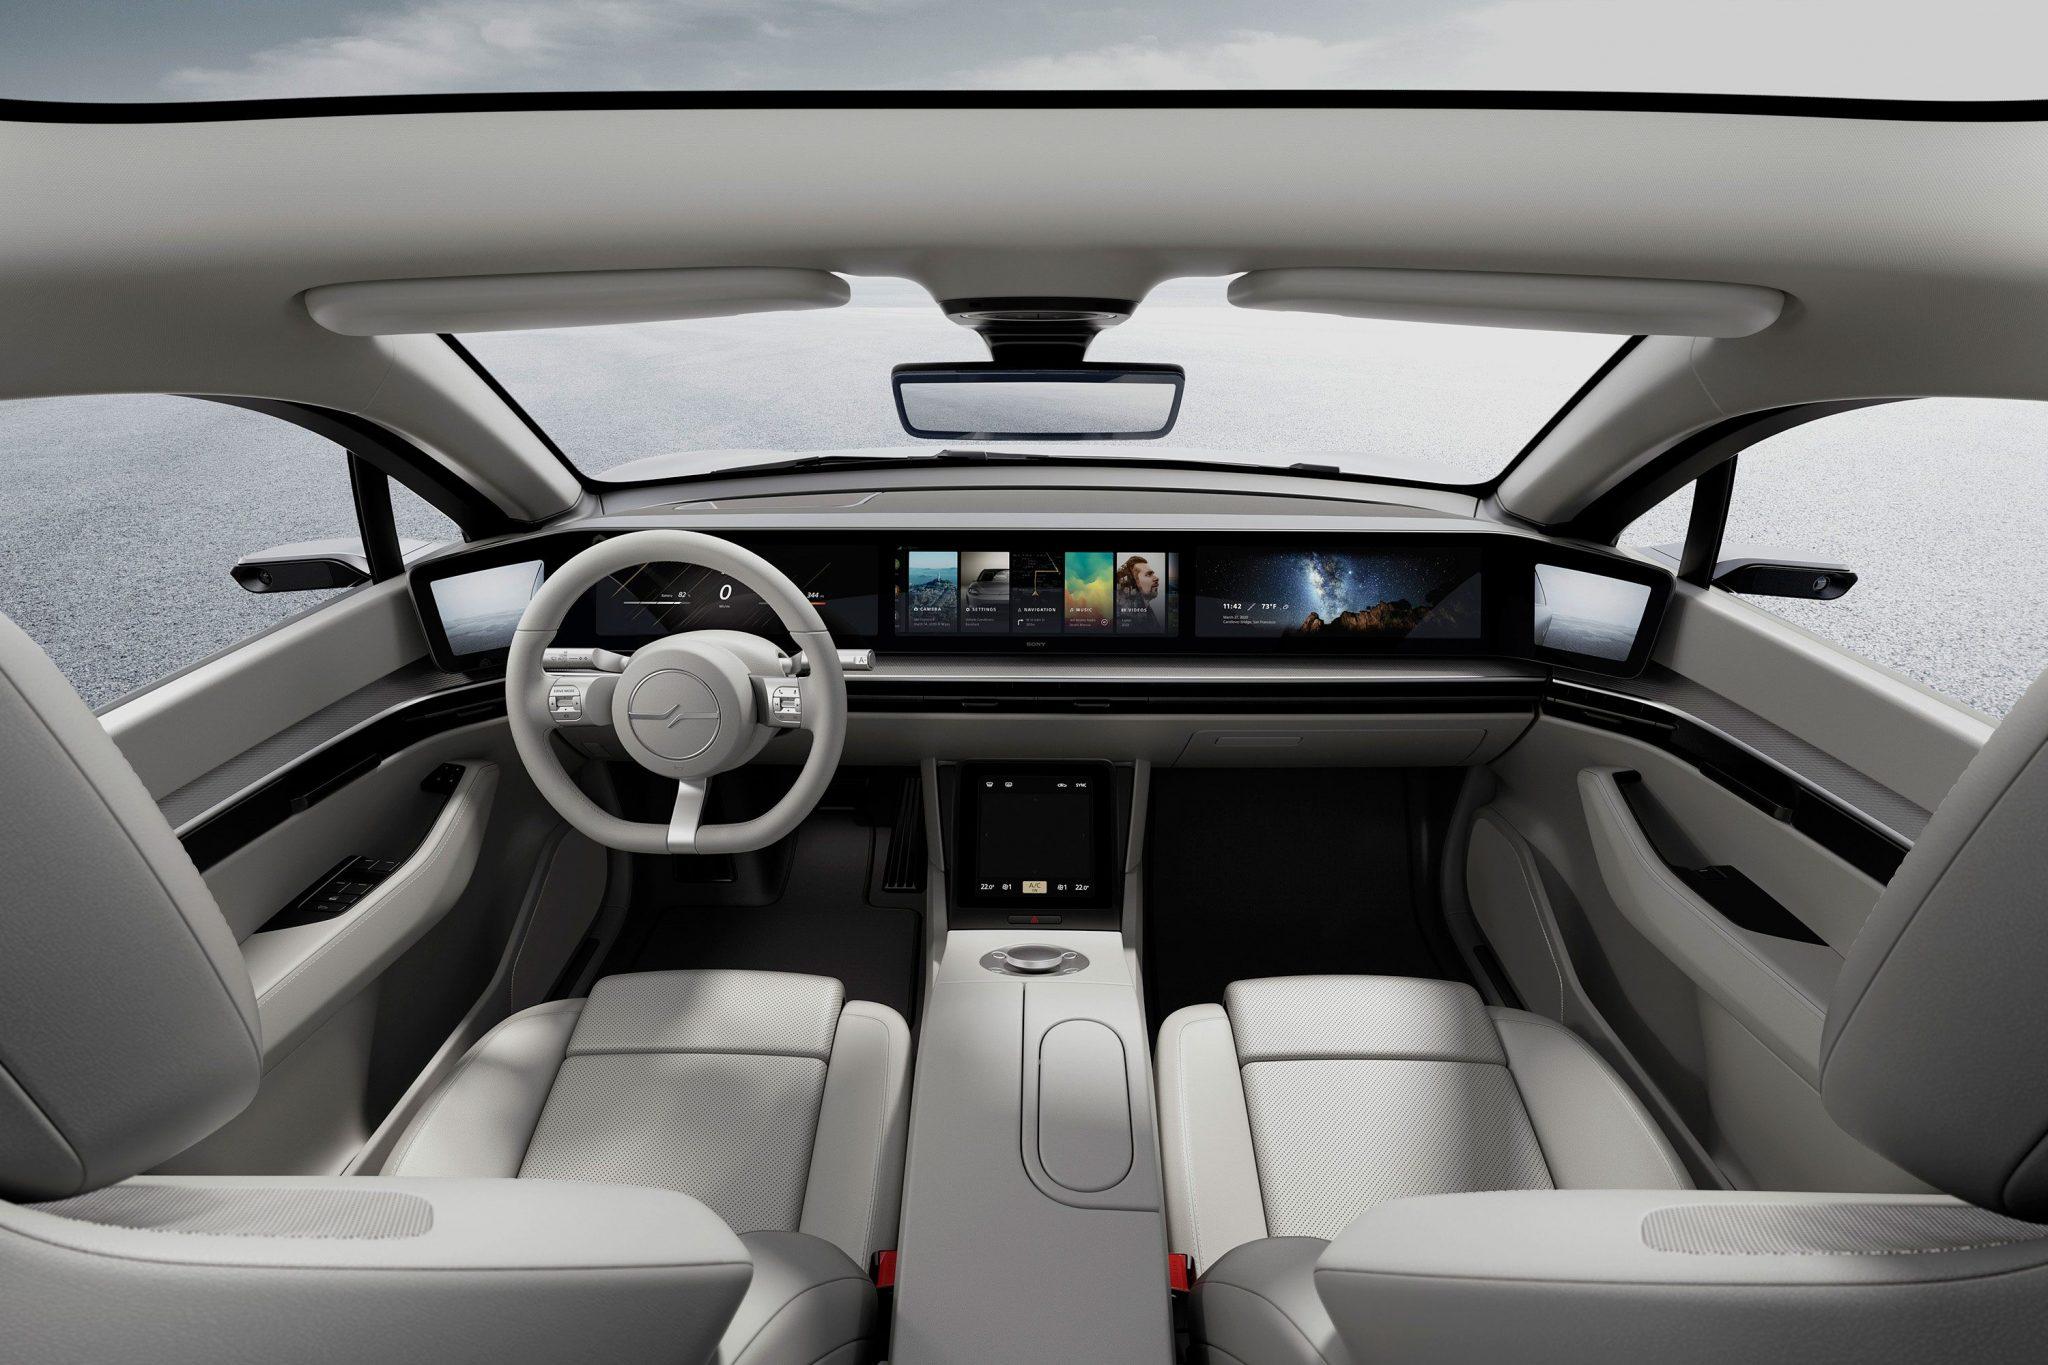 Sony Vision-S interni